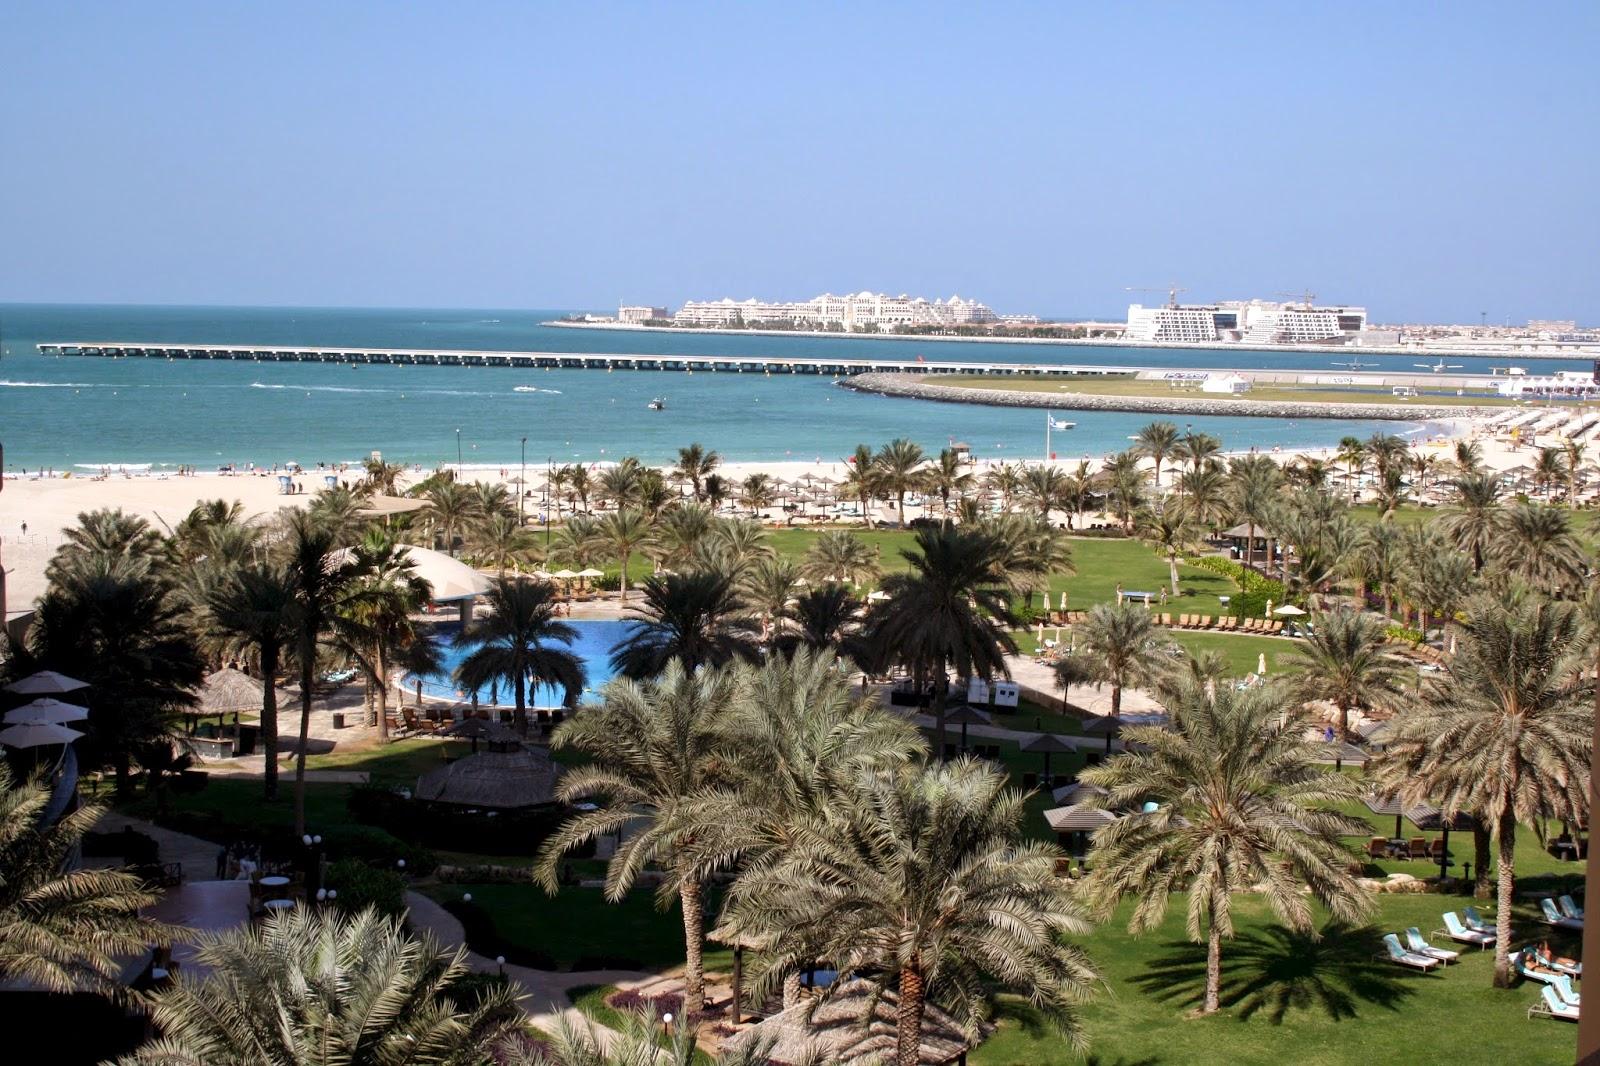 DUBAI PHOTO DIARY I. 11